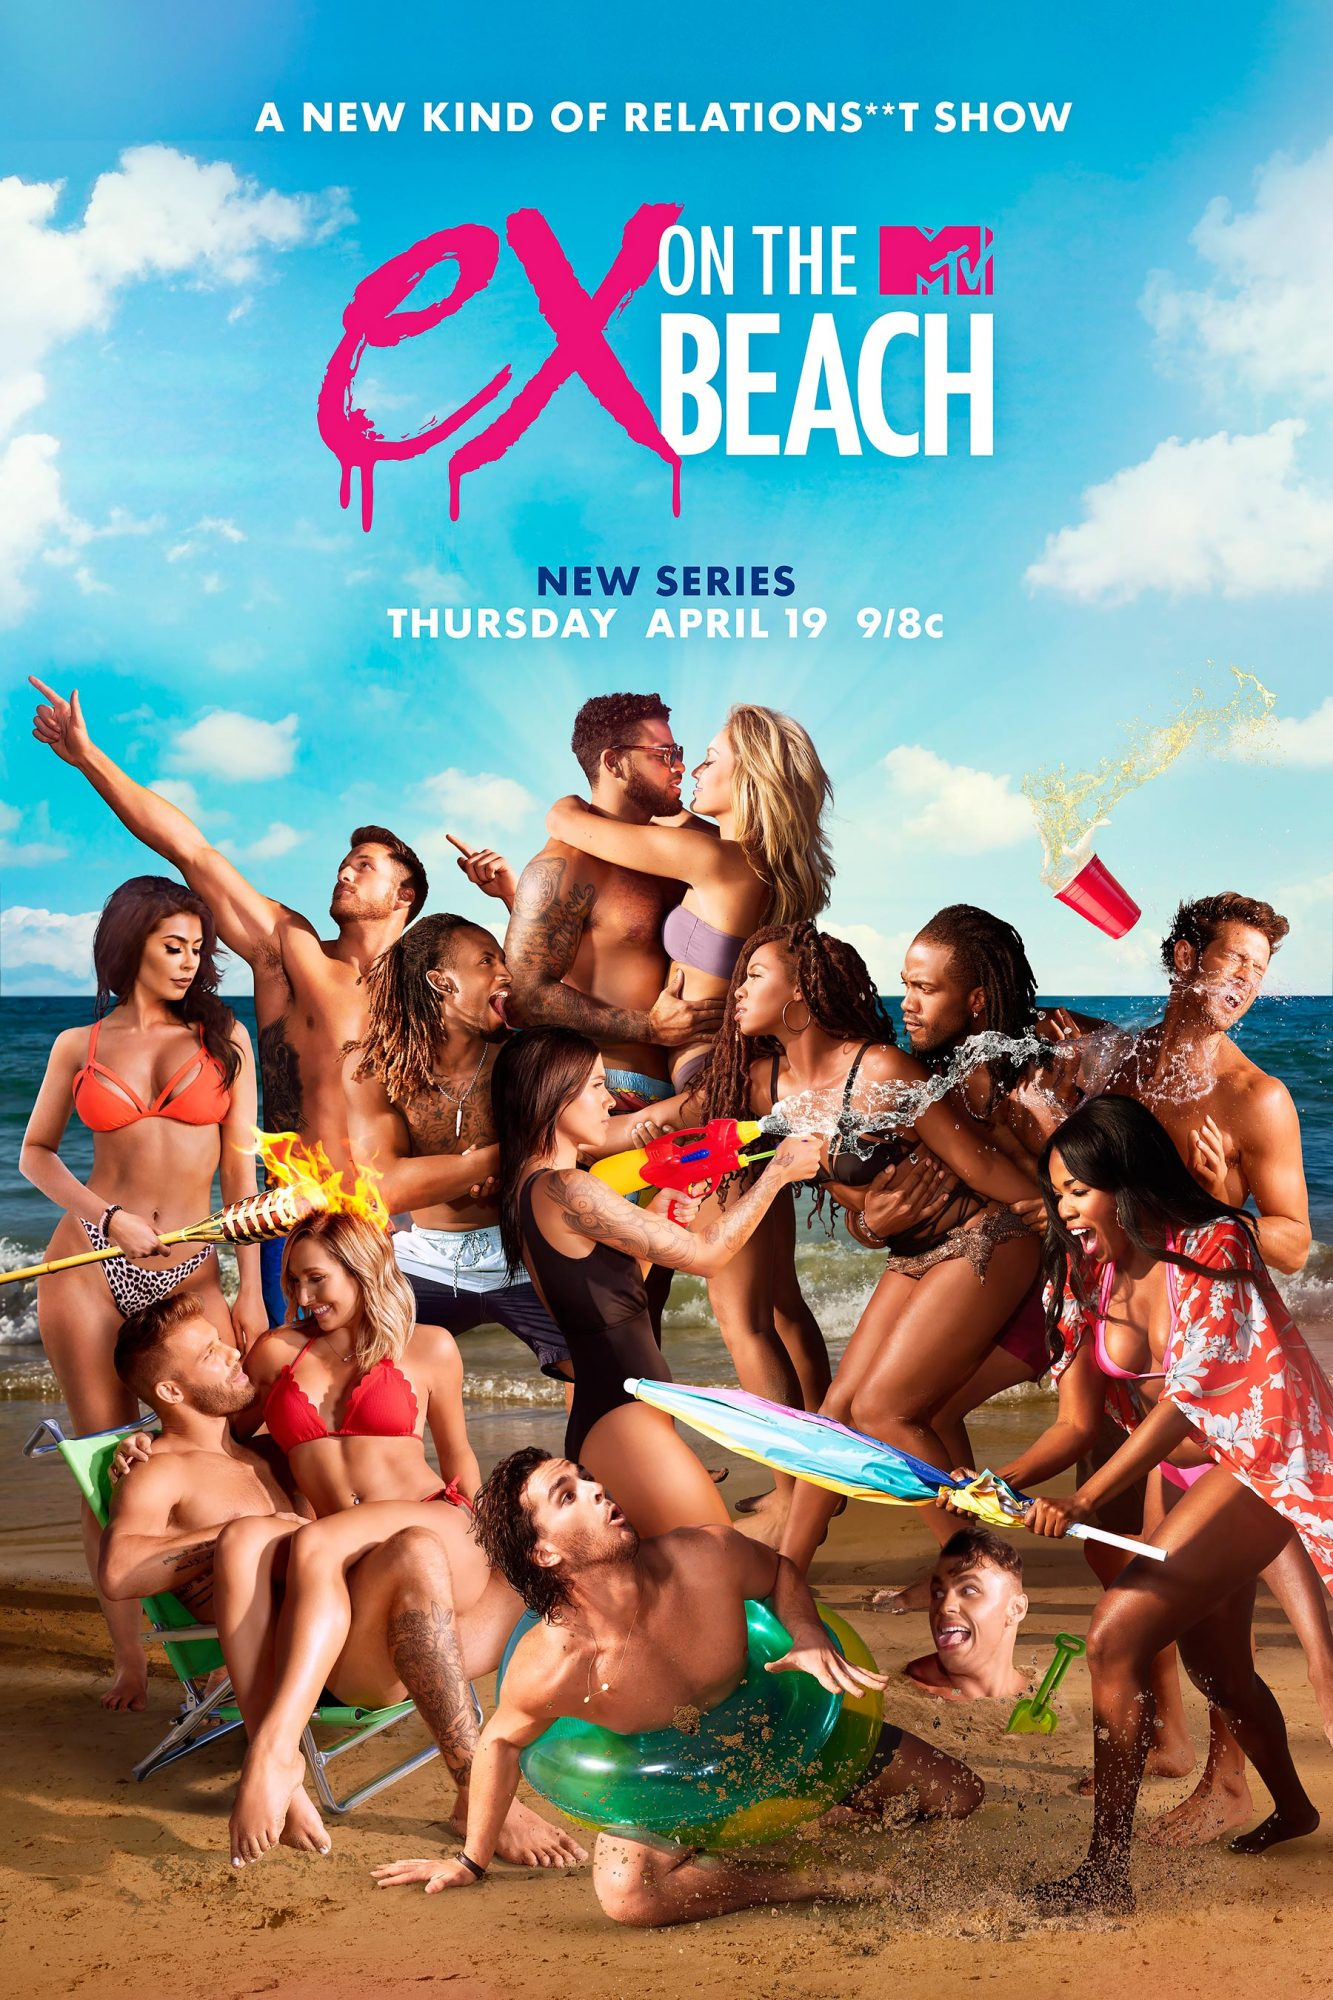 Ex On The Beach Key Art CR: MTV